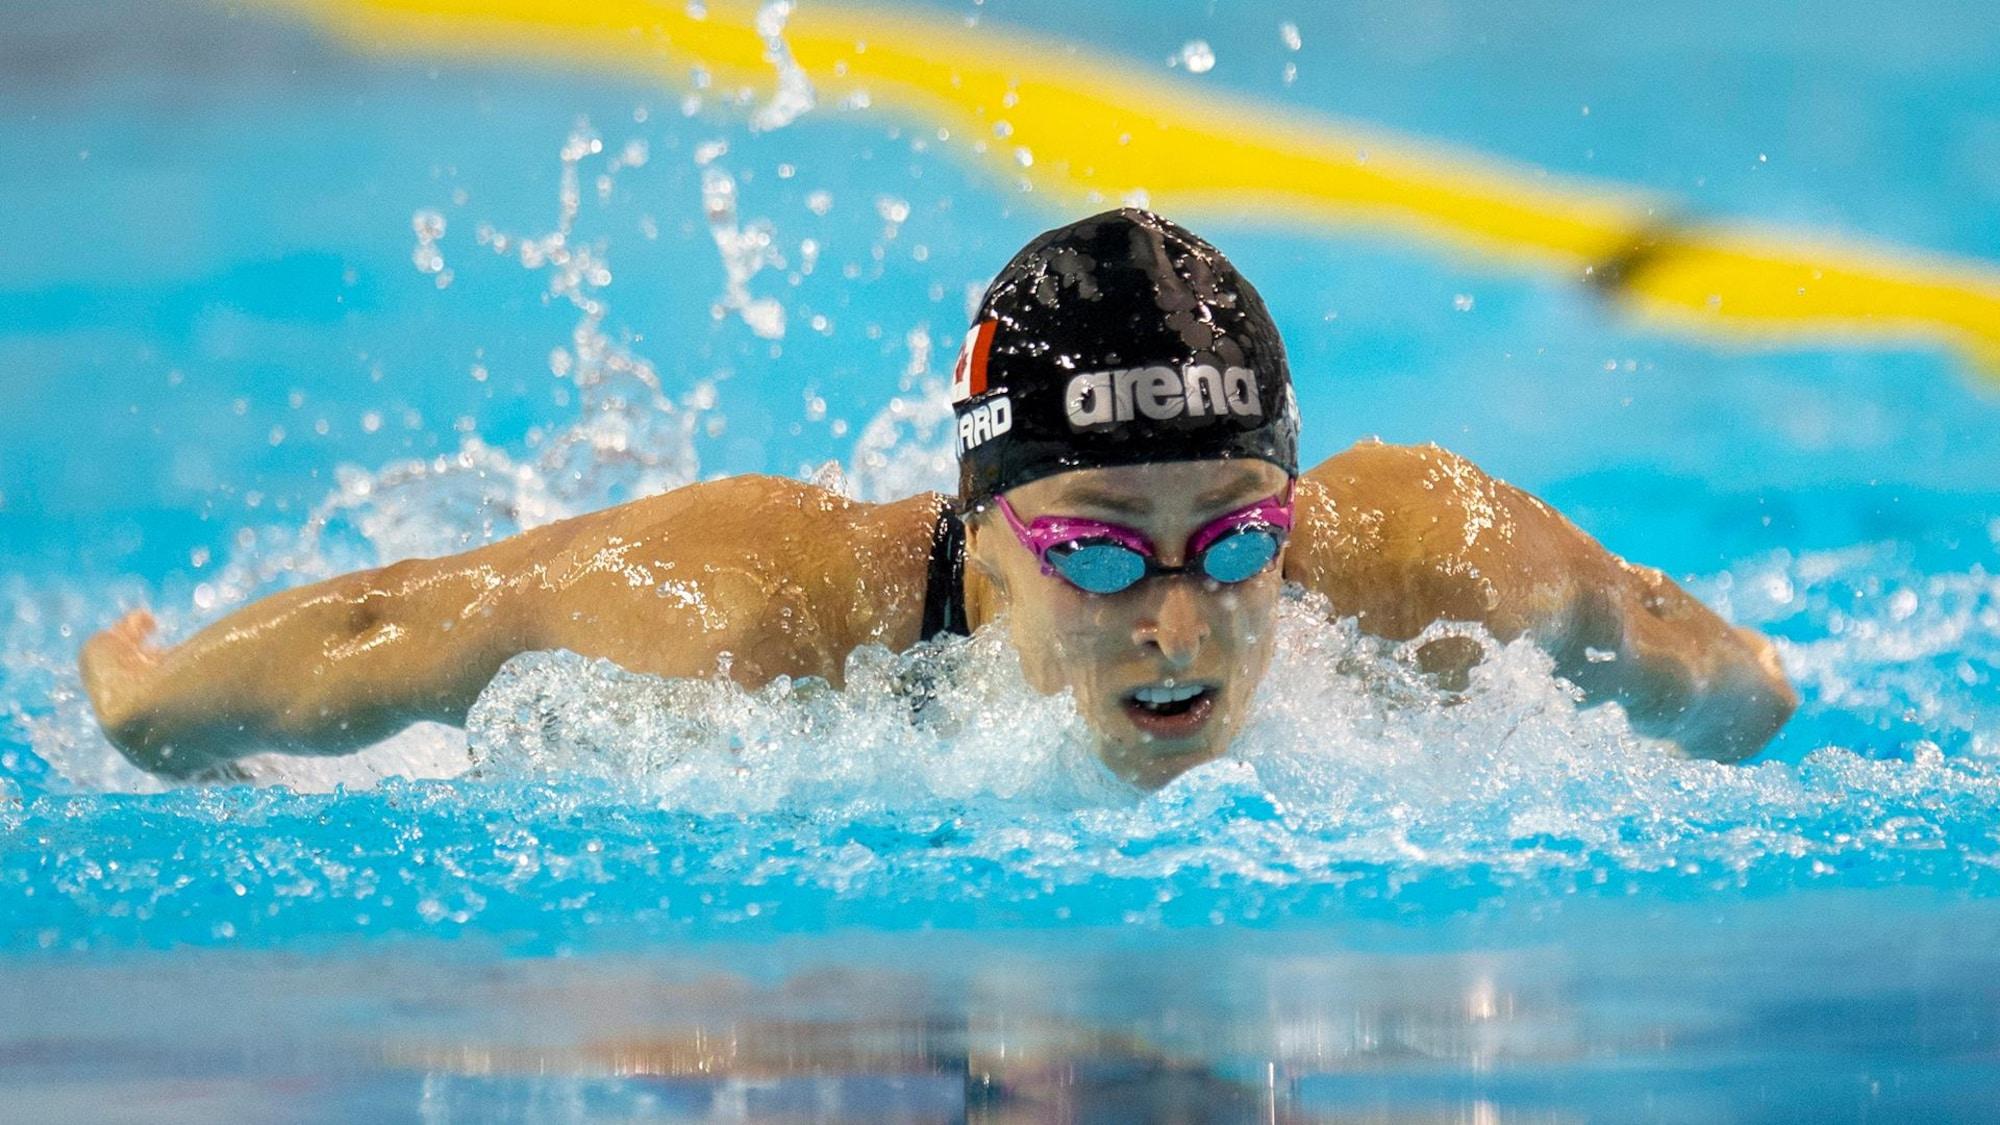 La nageuse prend une respiration pendant sa course.